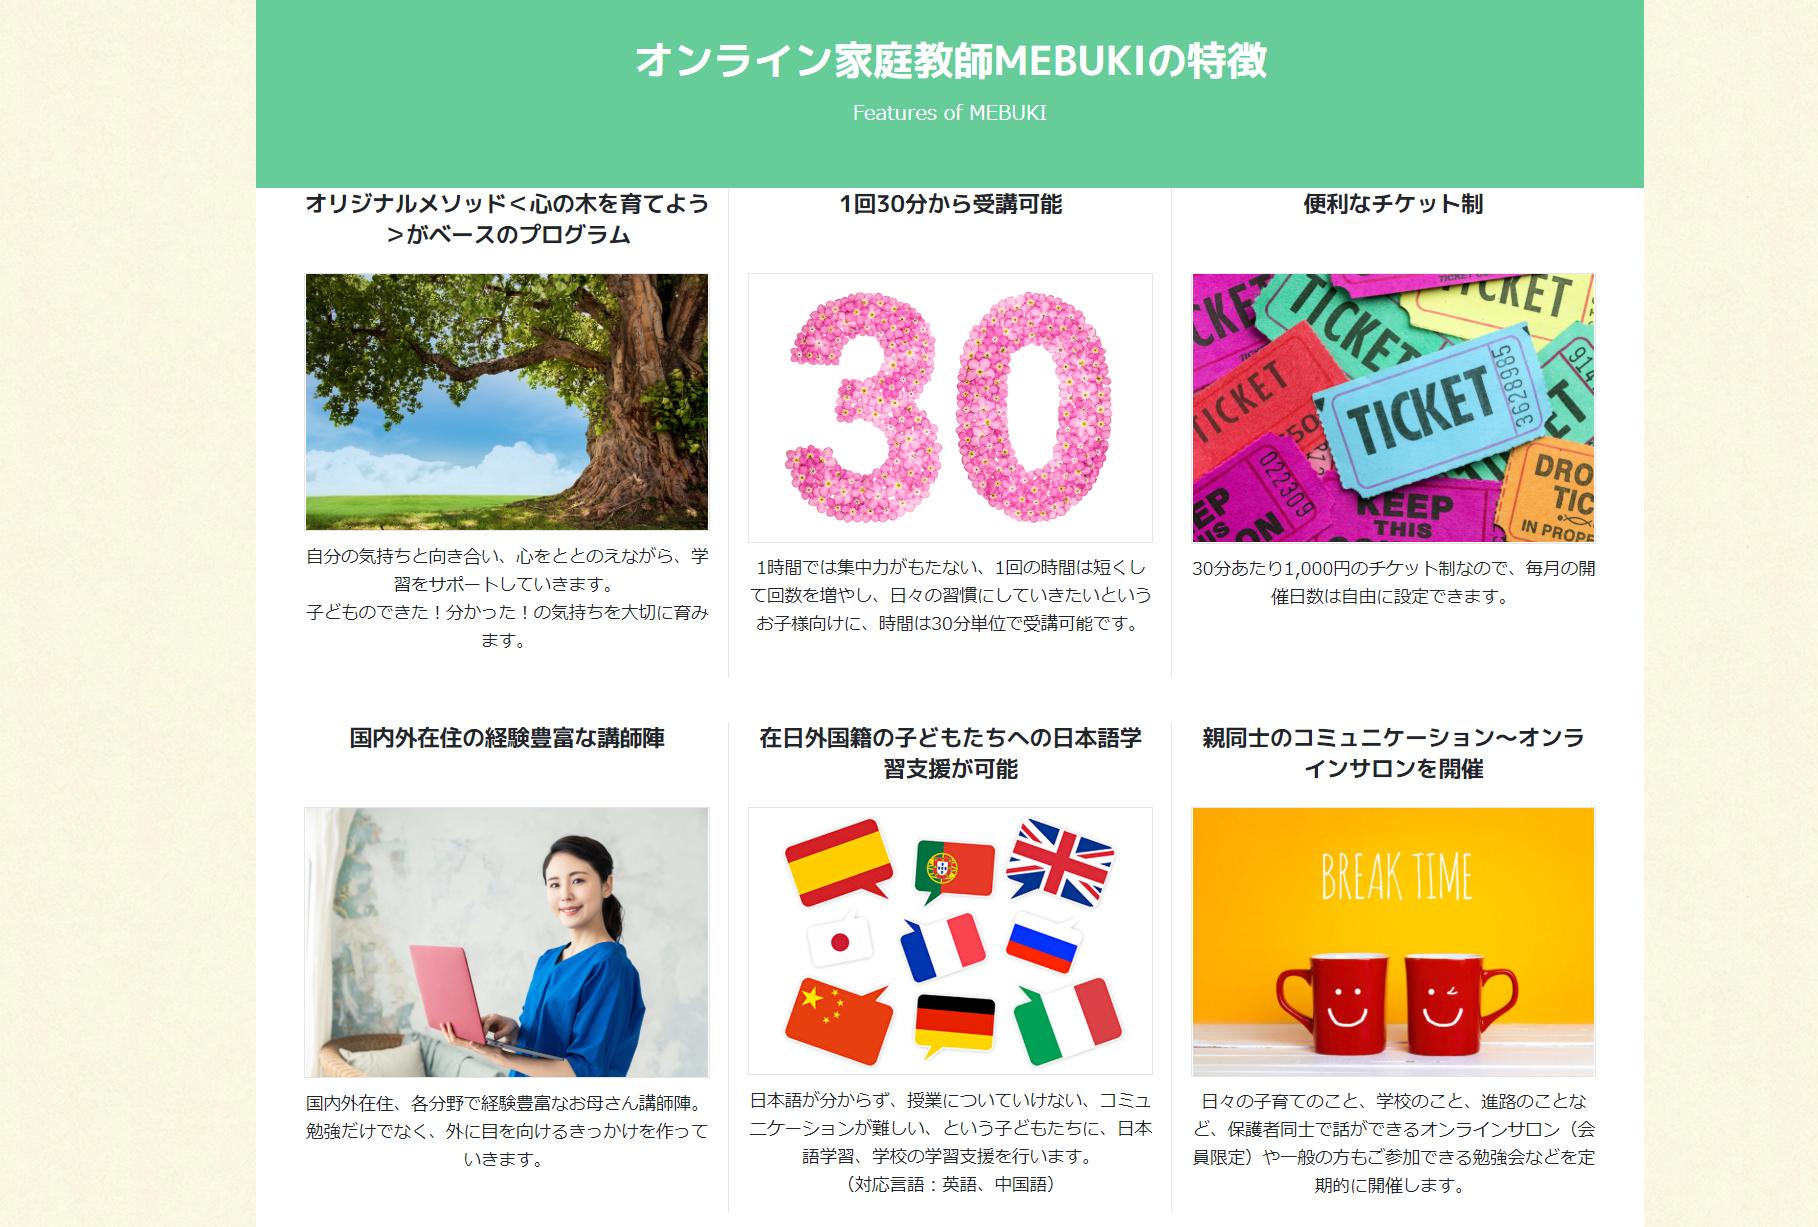 ZOOMを使ったオンライン家庭教師MEBUKI